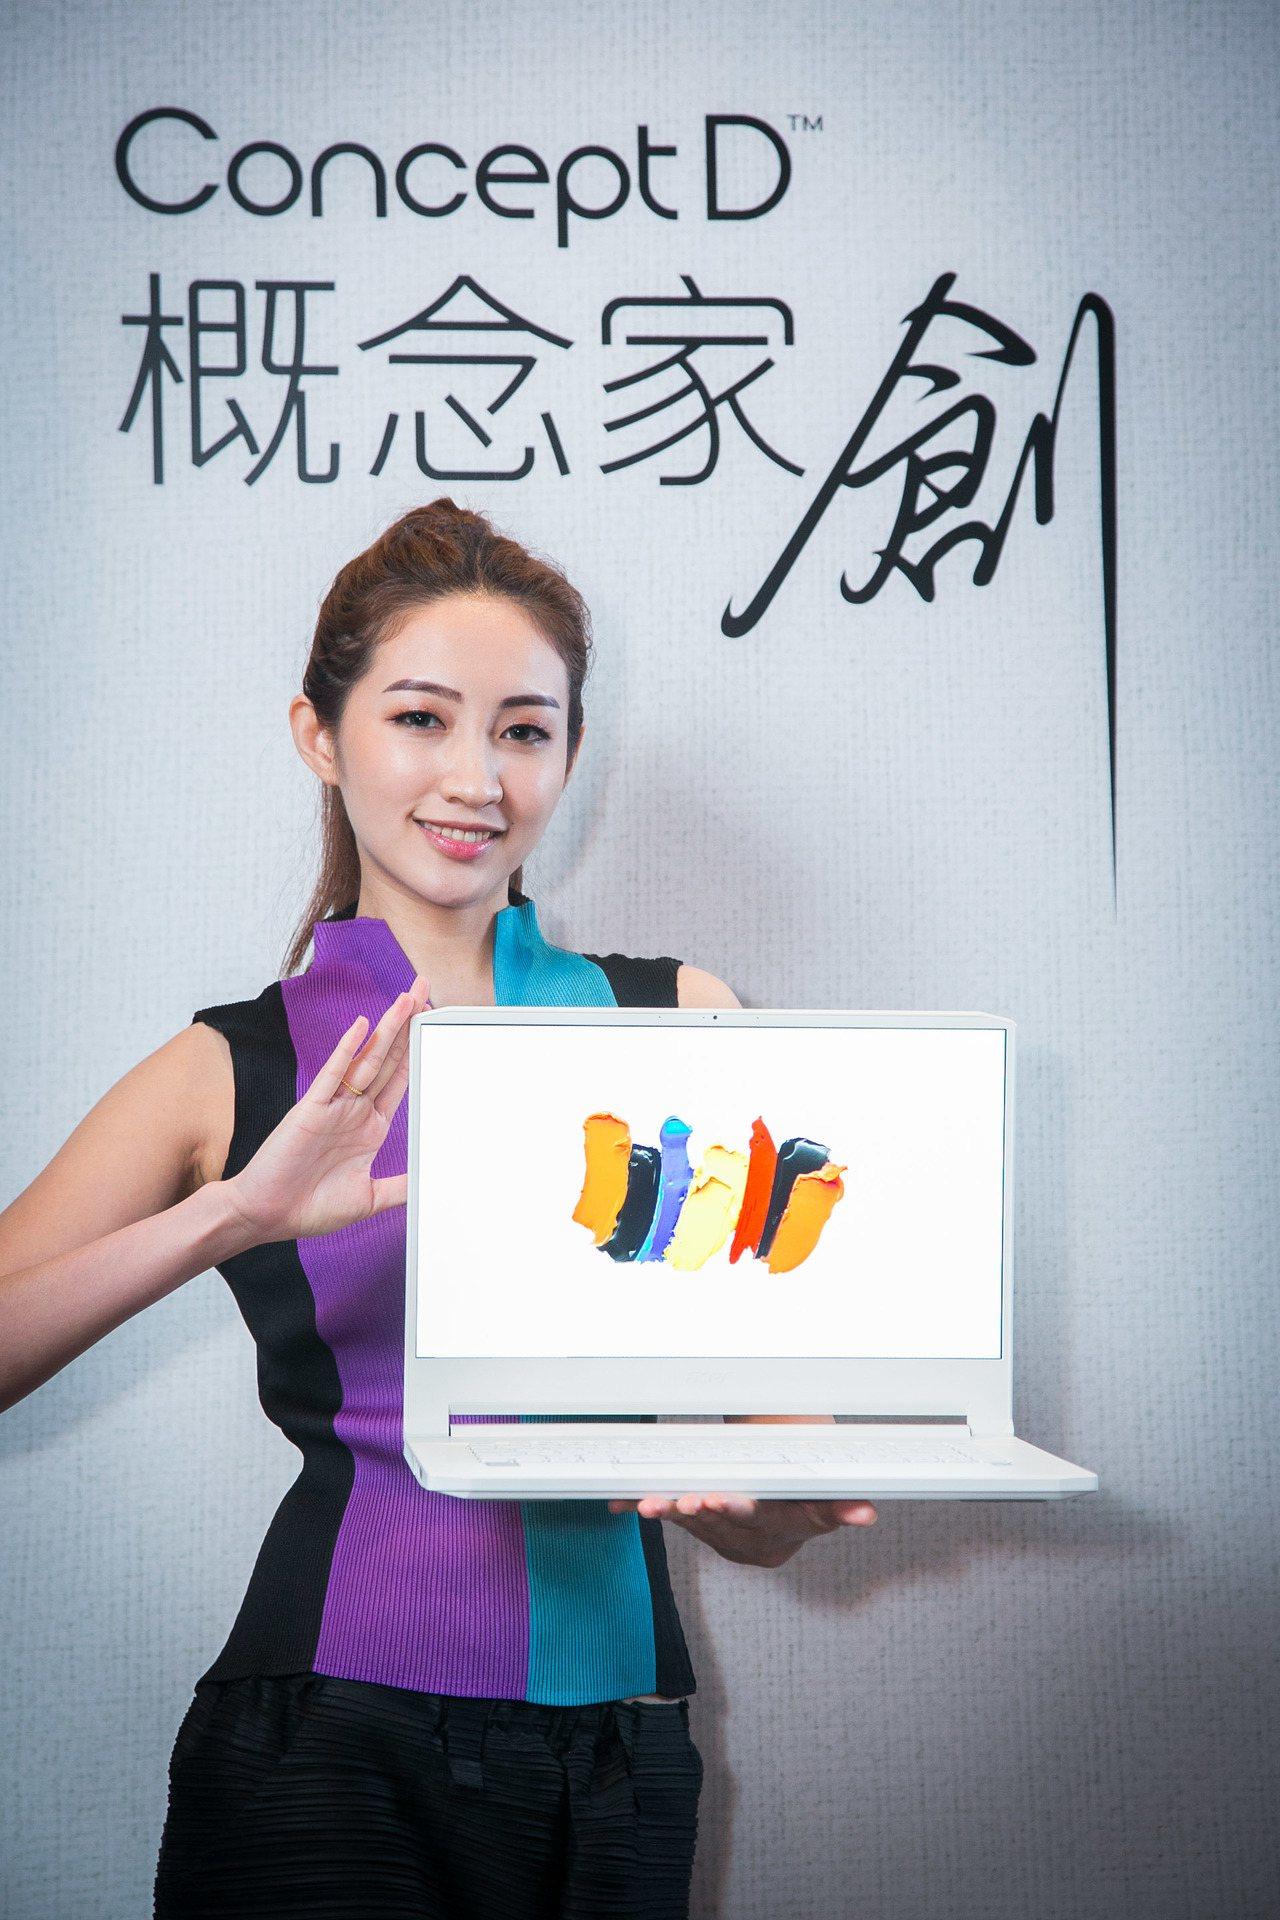 ConceptD 7筆電,建議售價89,900元起。隨貨附贈微軟中文Office...